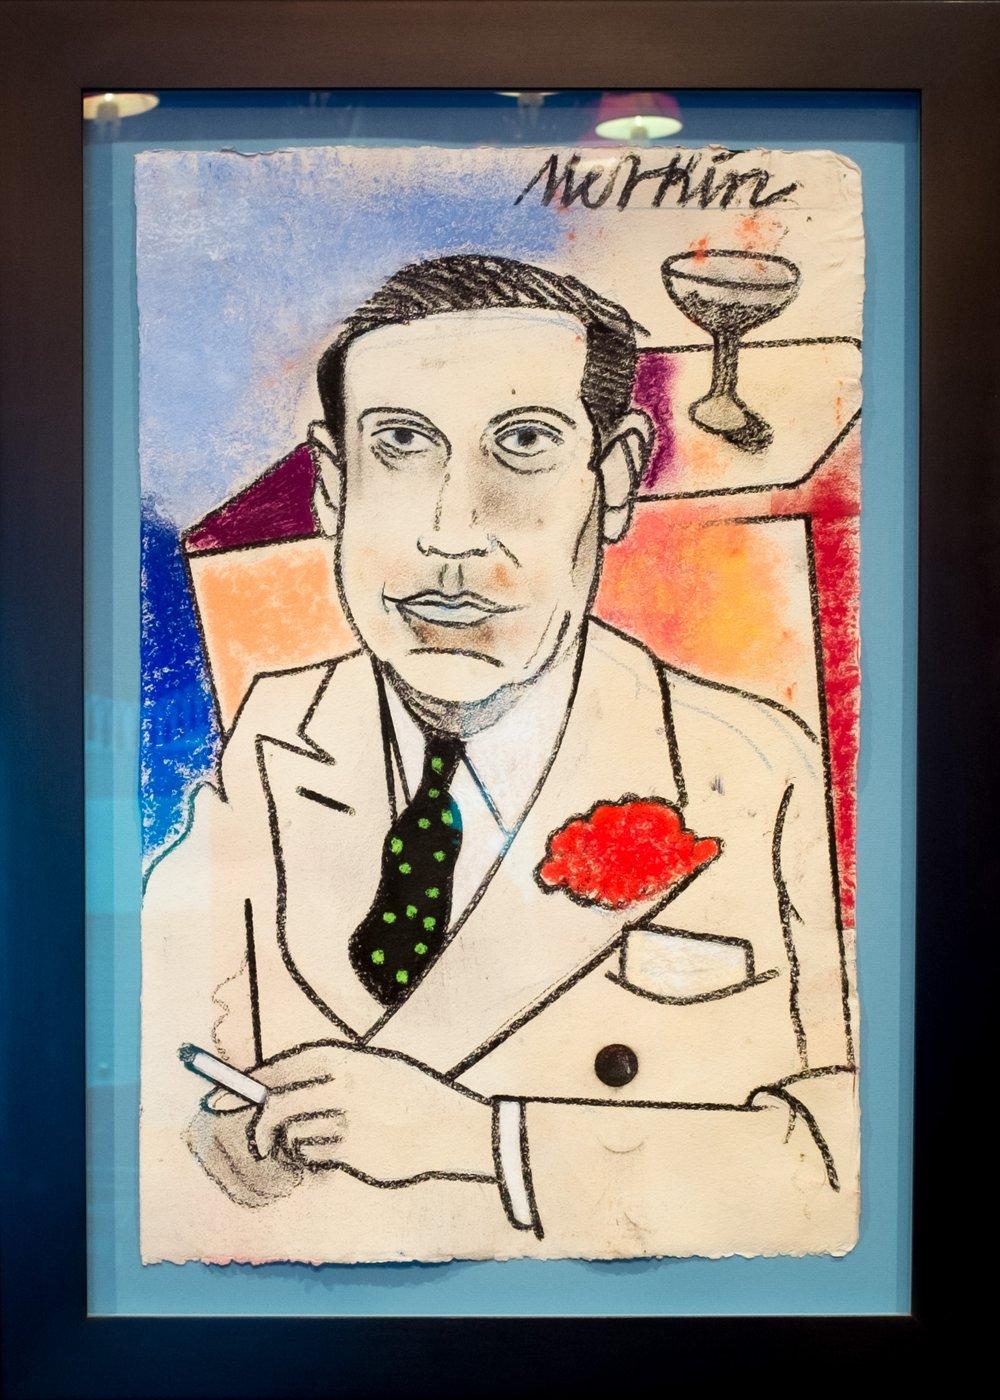 Merkin's portrait of Cole Porter - hanging in Alan's office.